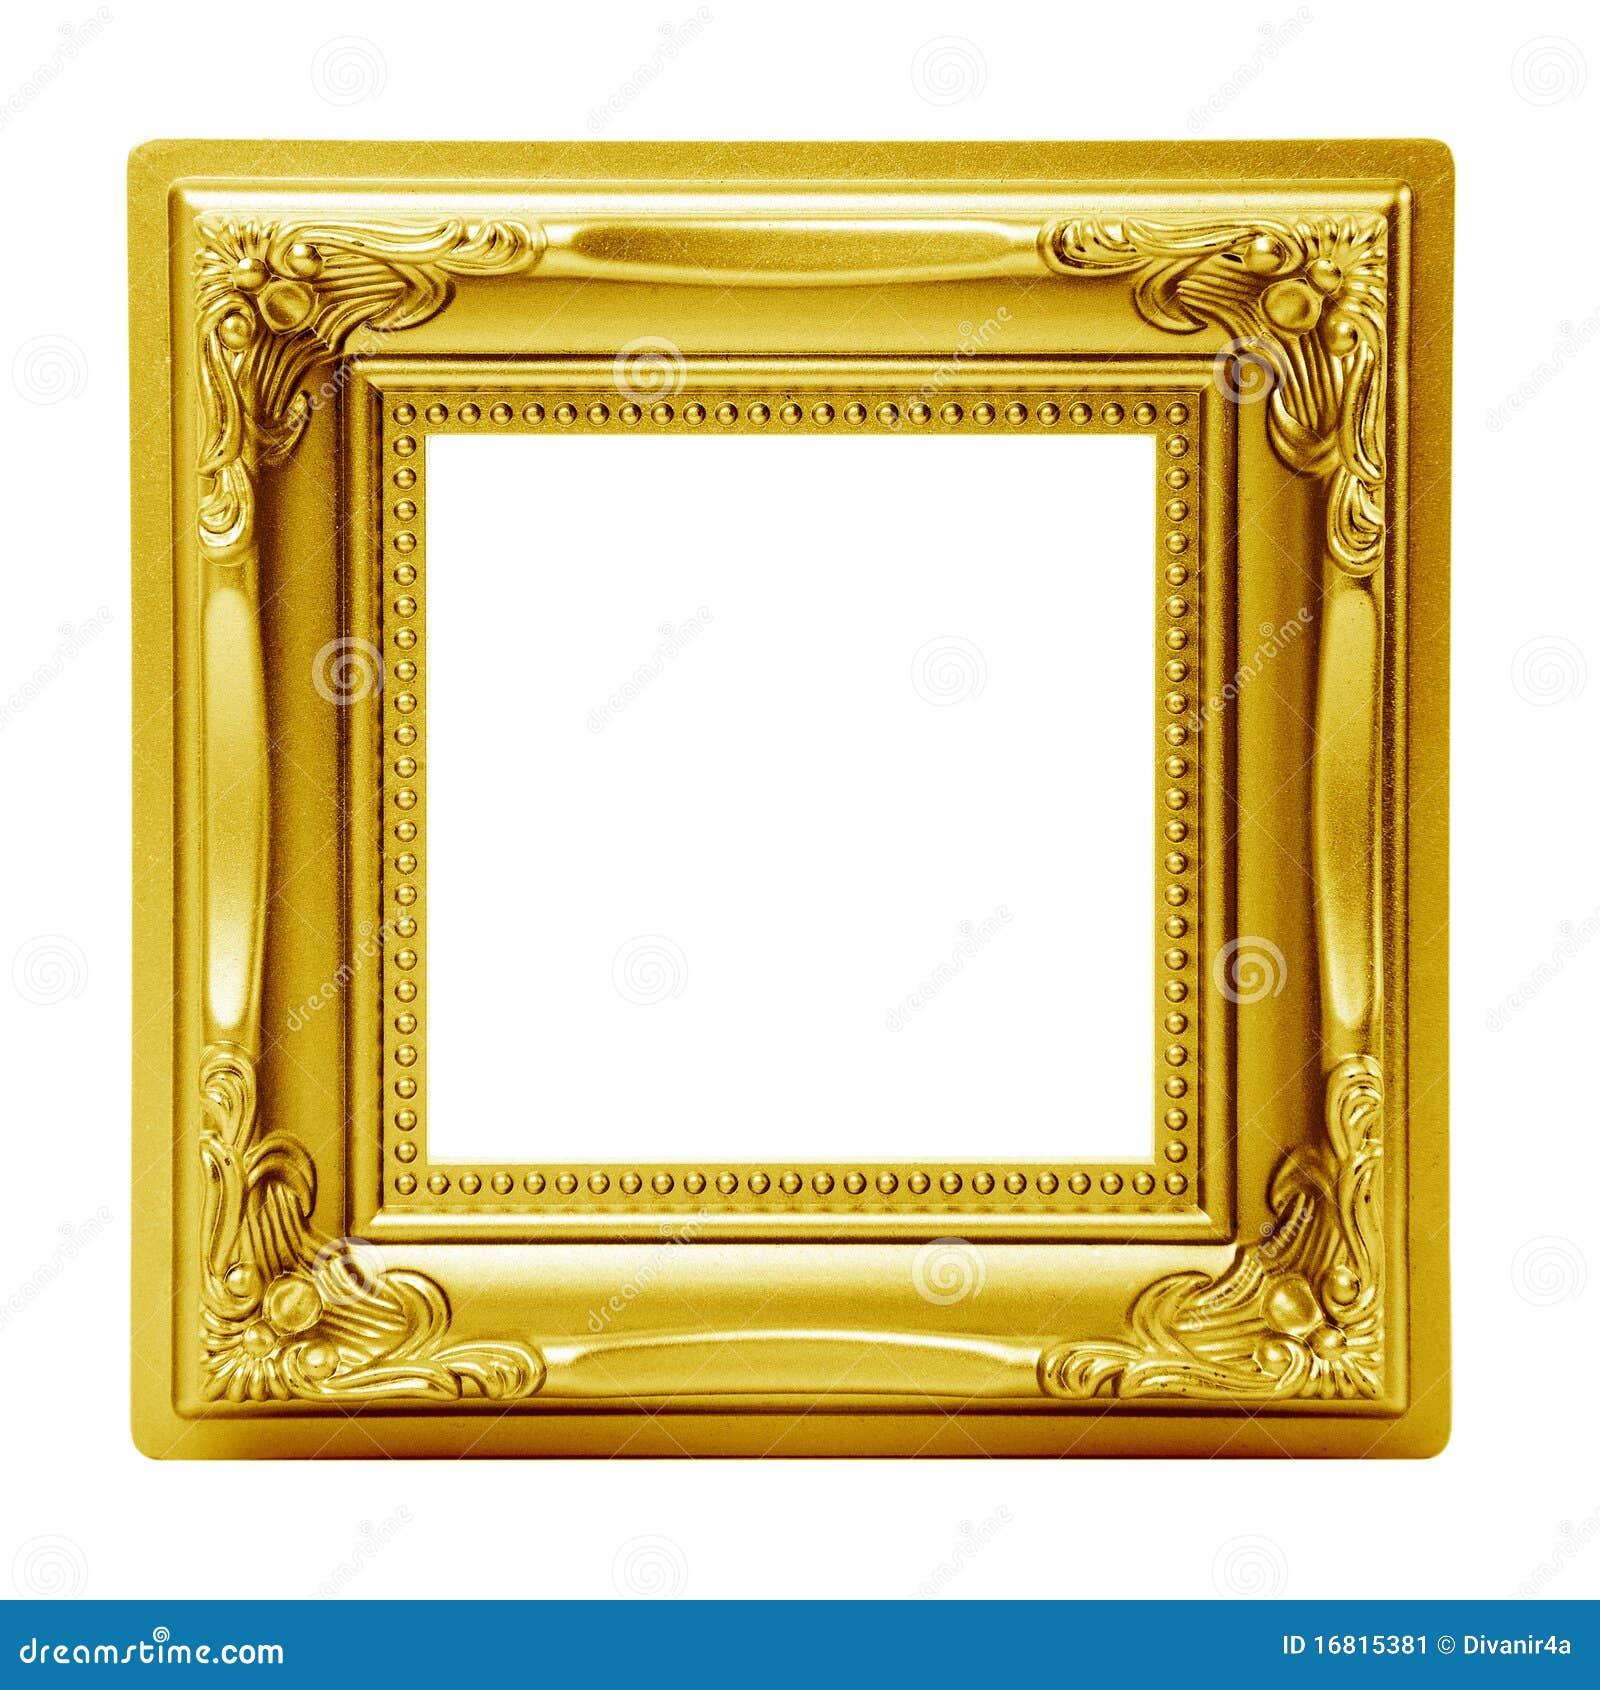 Gemütlich 11x14 Gold Bilderrahmen Bilder - Rahmen Ideen ...